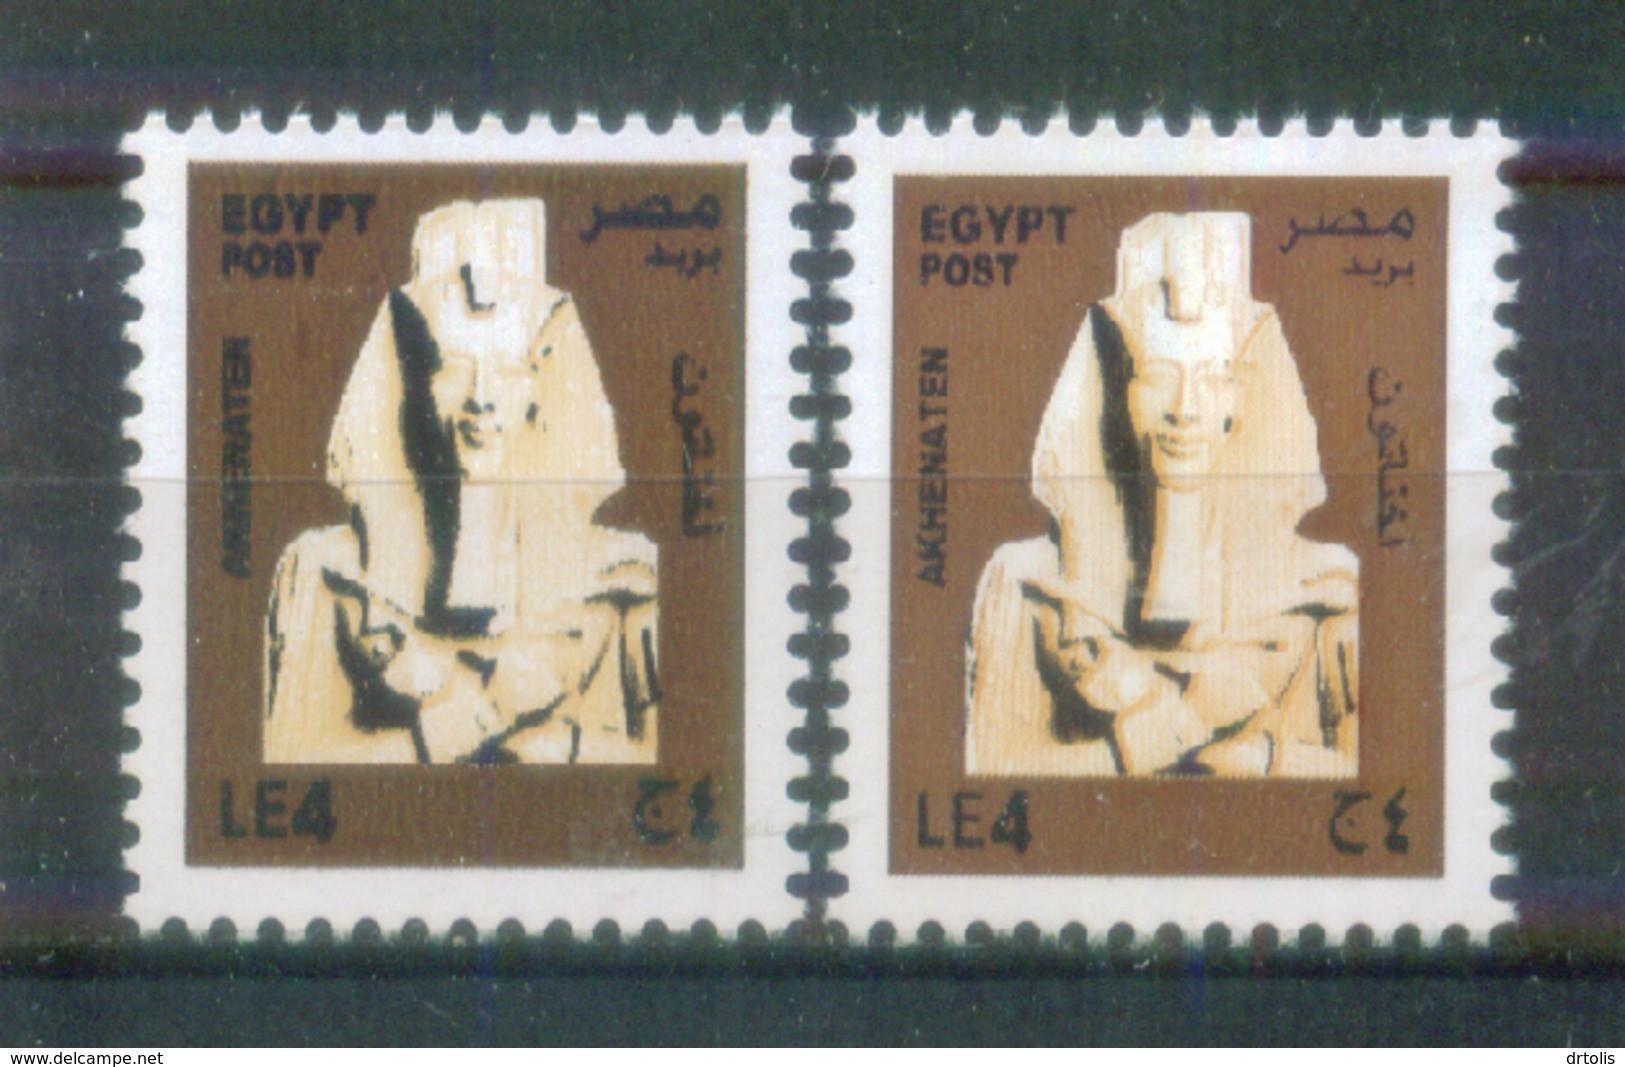 EGYPT / 2017 / COLOR VARIETY / AKHENATEN / ARCHEOLOGY / EGYPTOLOGY / MNH / VF . - Nuovi